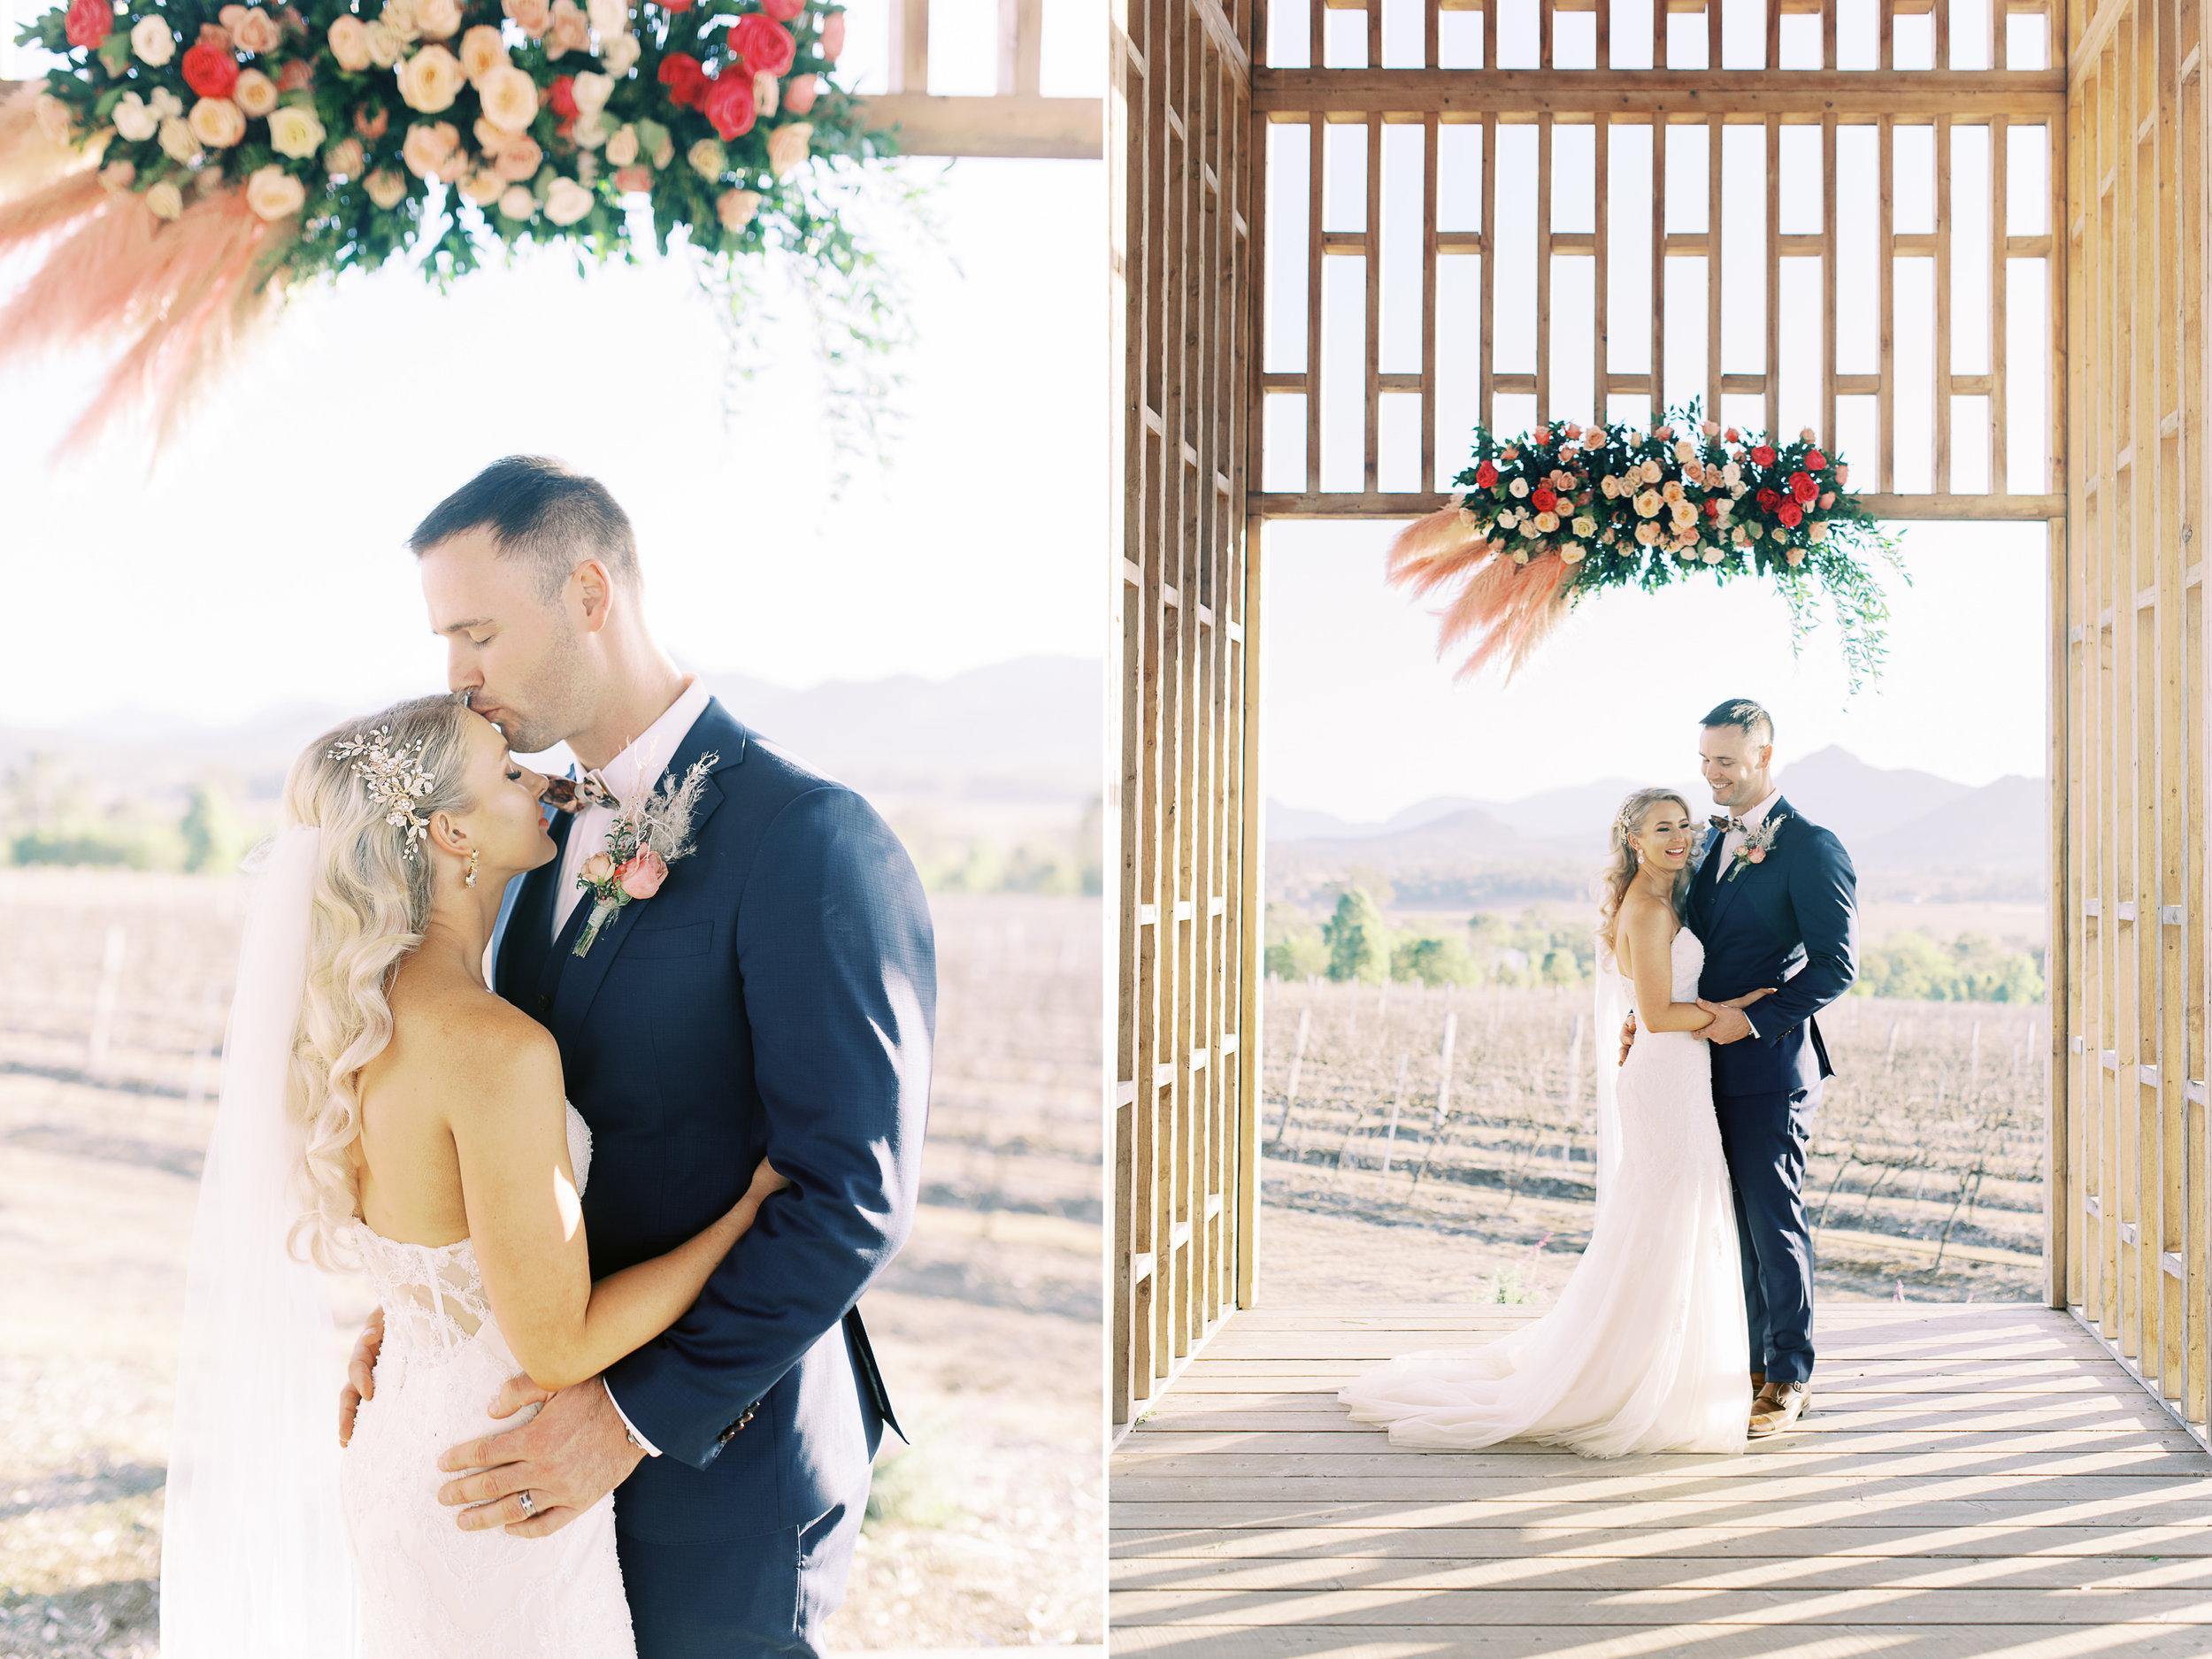 kooroomba-lavendar-farm-film-photography-wedding-photography-romantic-20.jpg